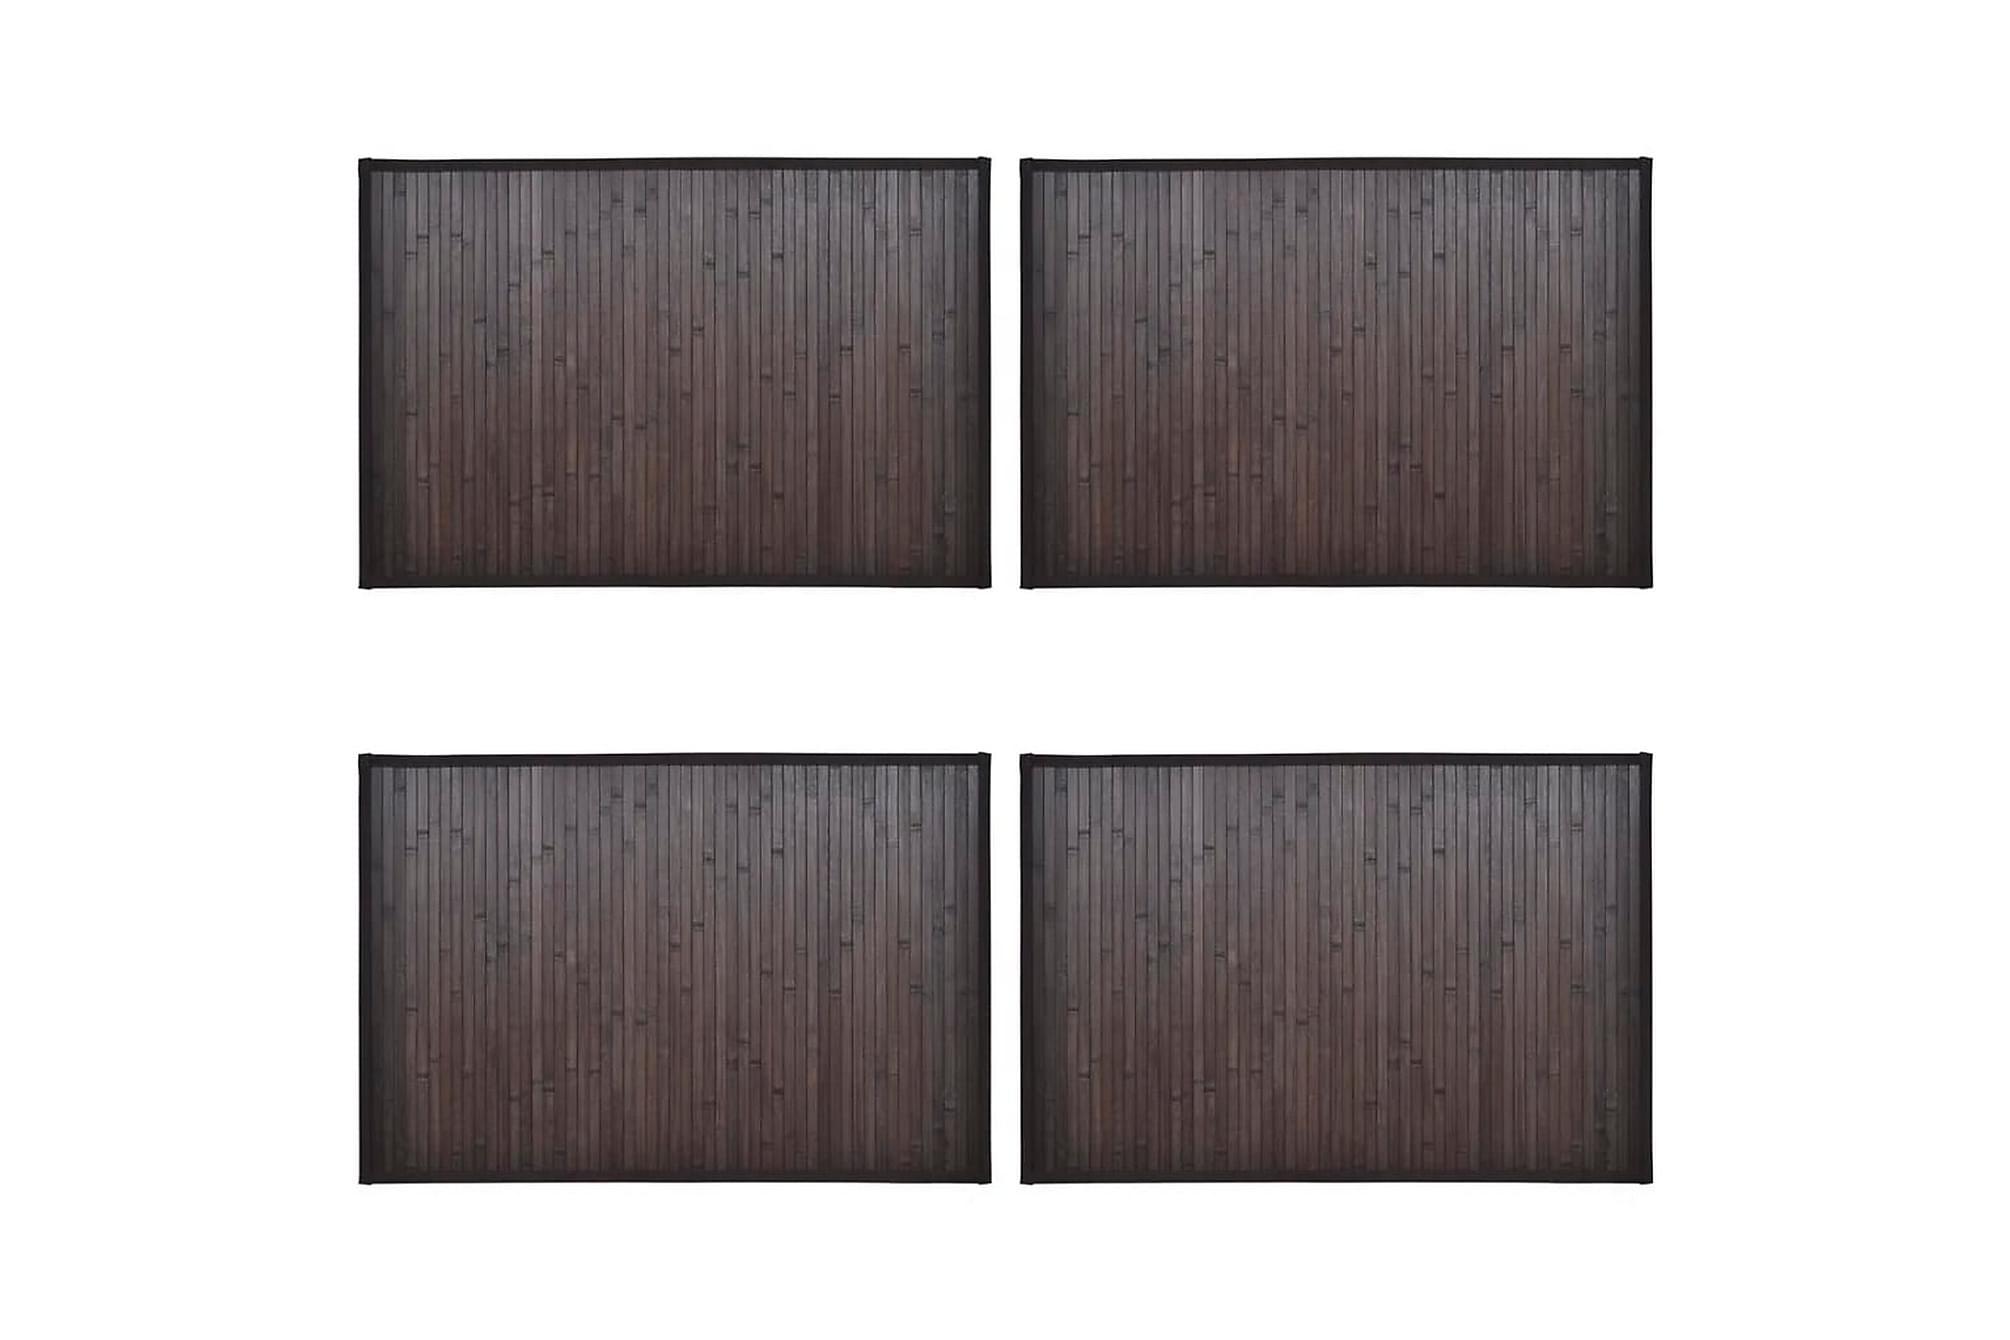 Bambumattor 4 st 40x50 cm mörkbrun, Badrumsmattor